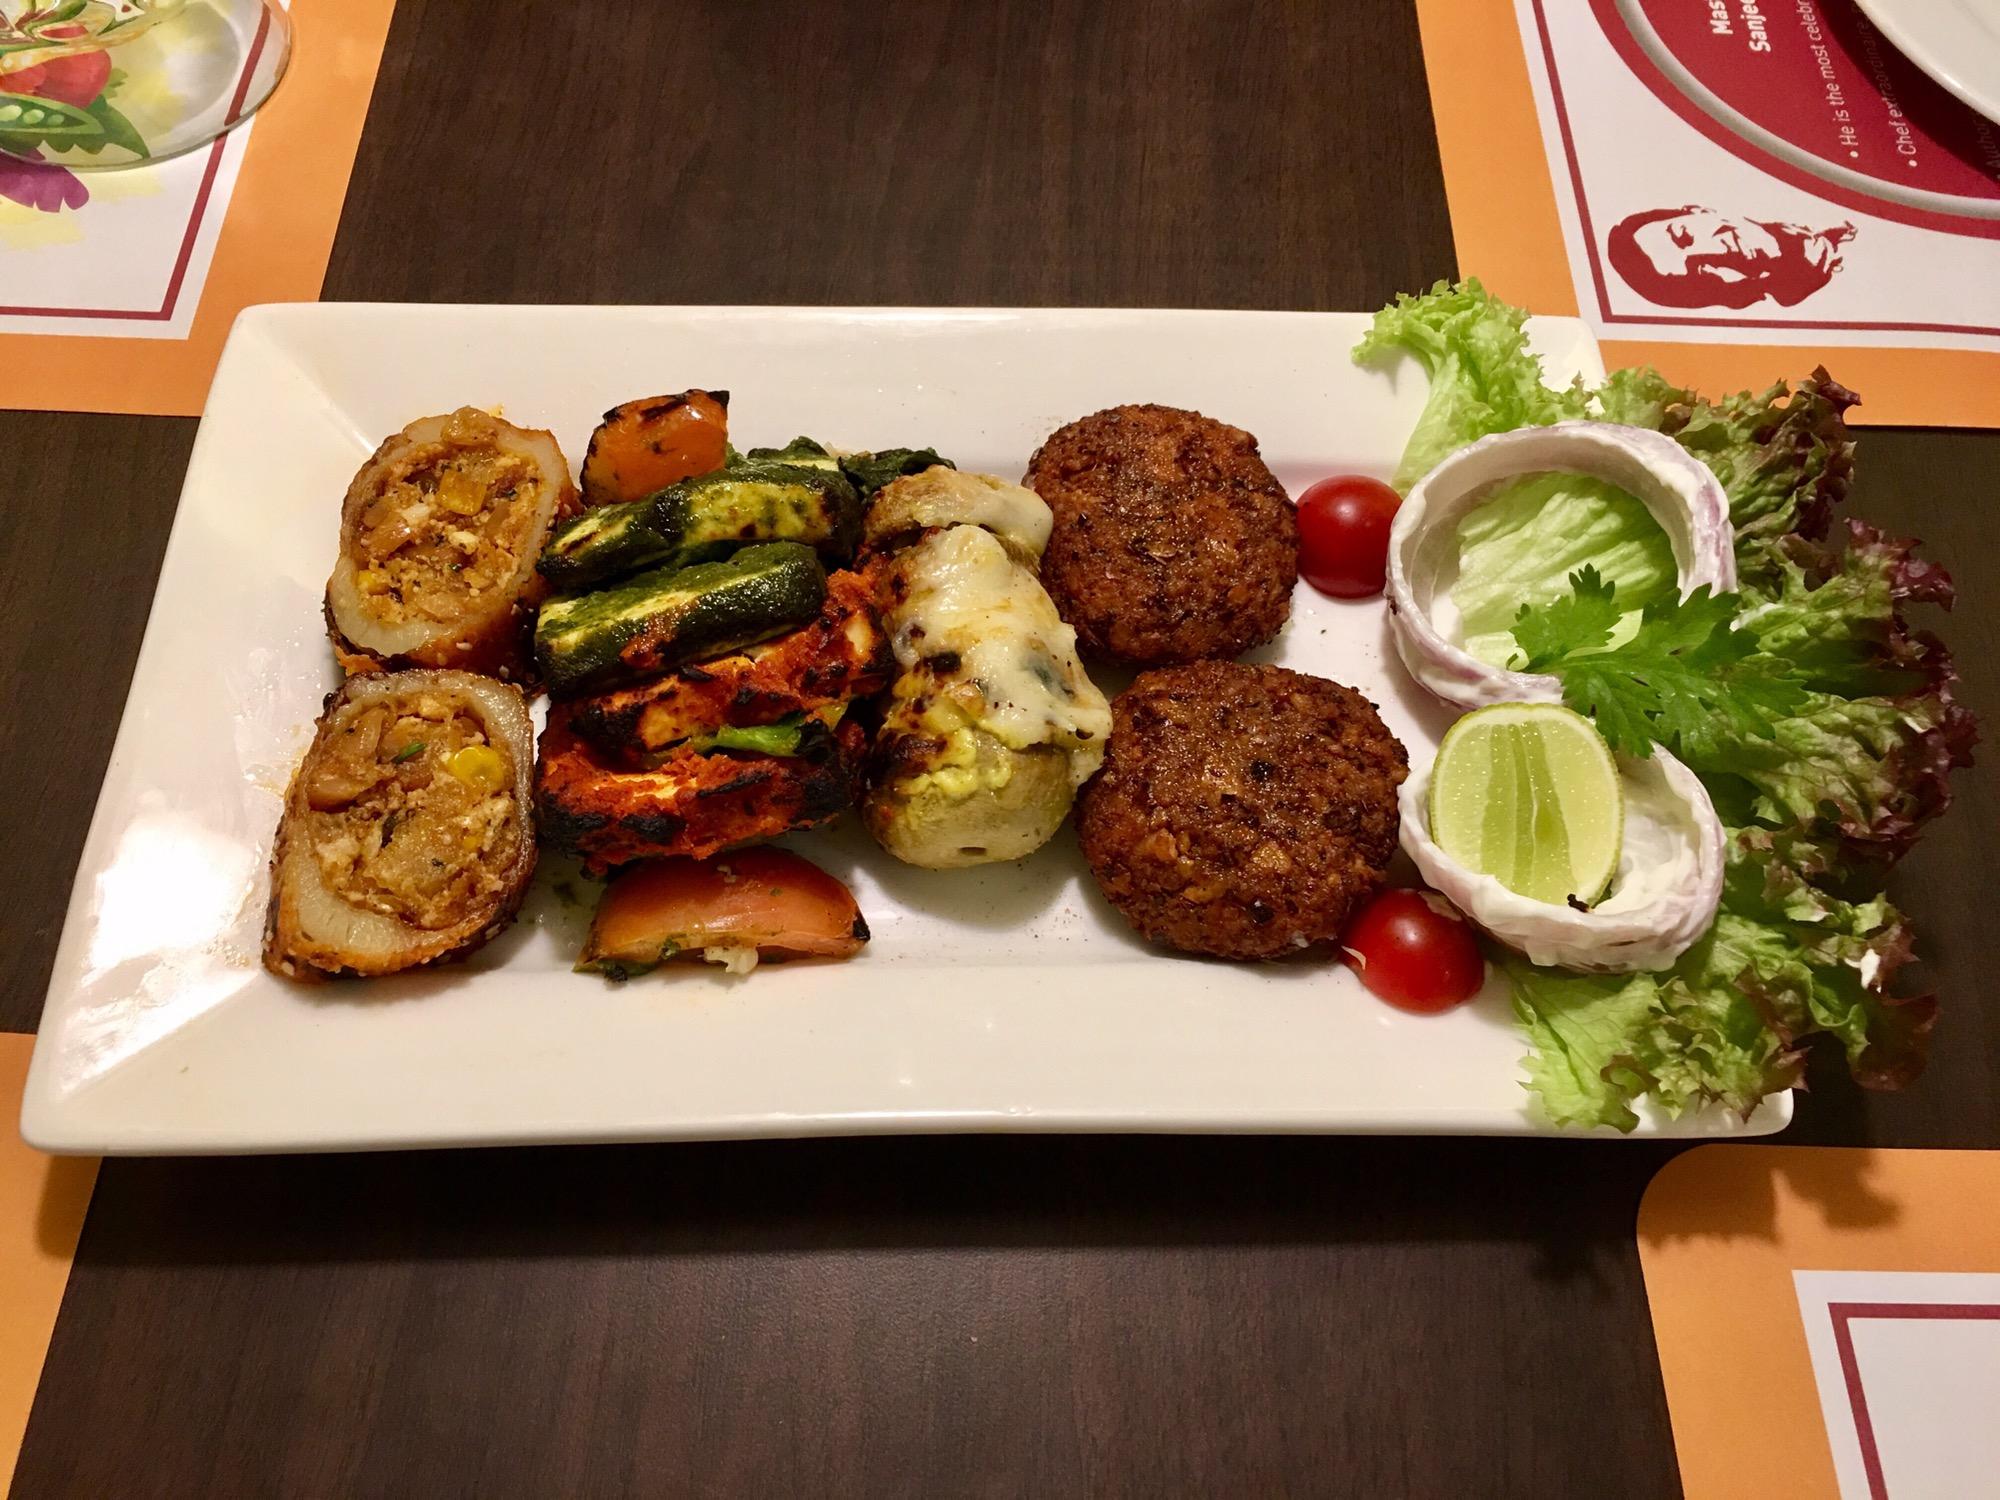 Grilled vegetables recipe by sanjeev kapoor best vegetable 2017 healthy food recipes by master chef sanjeev kapoor forumfinder Gallery